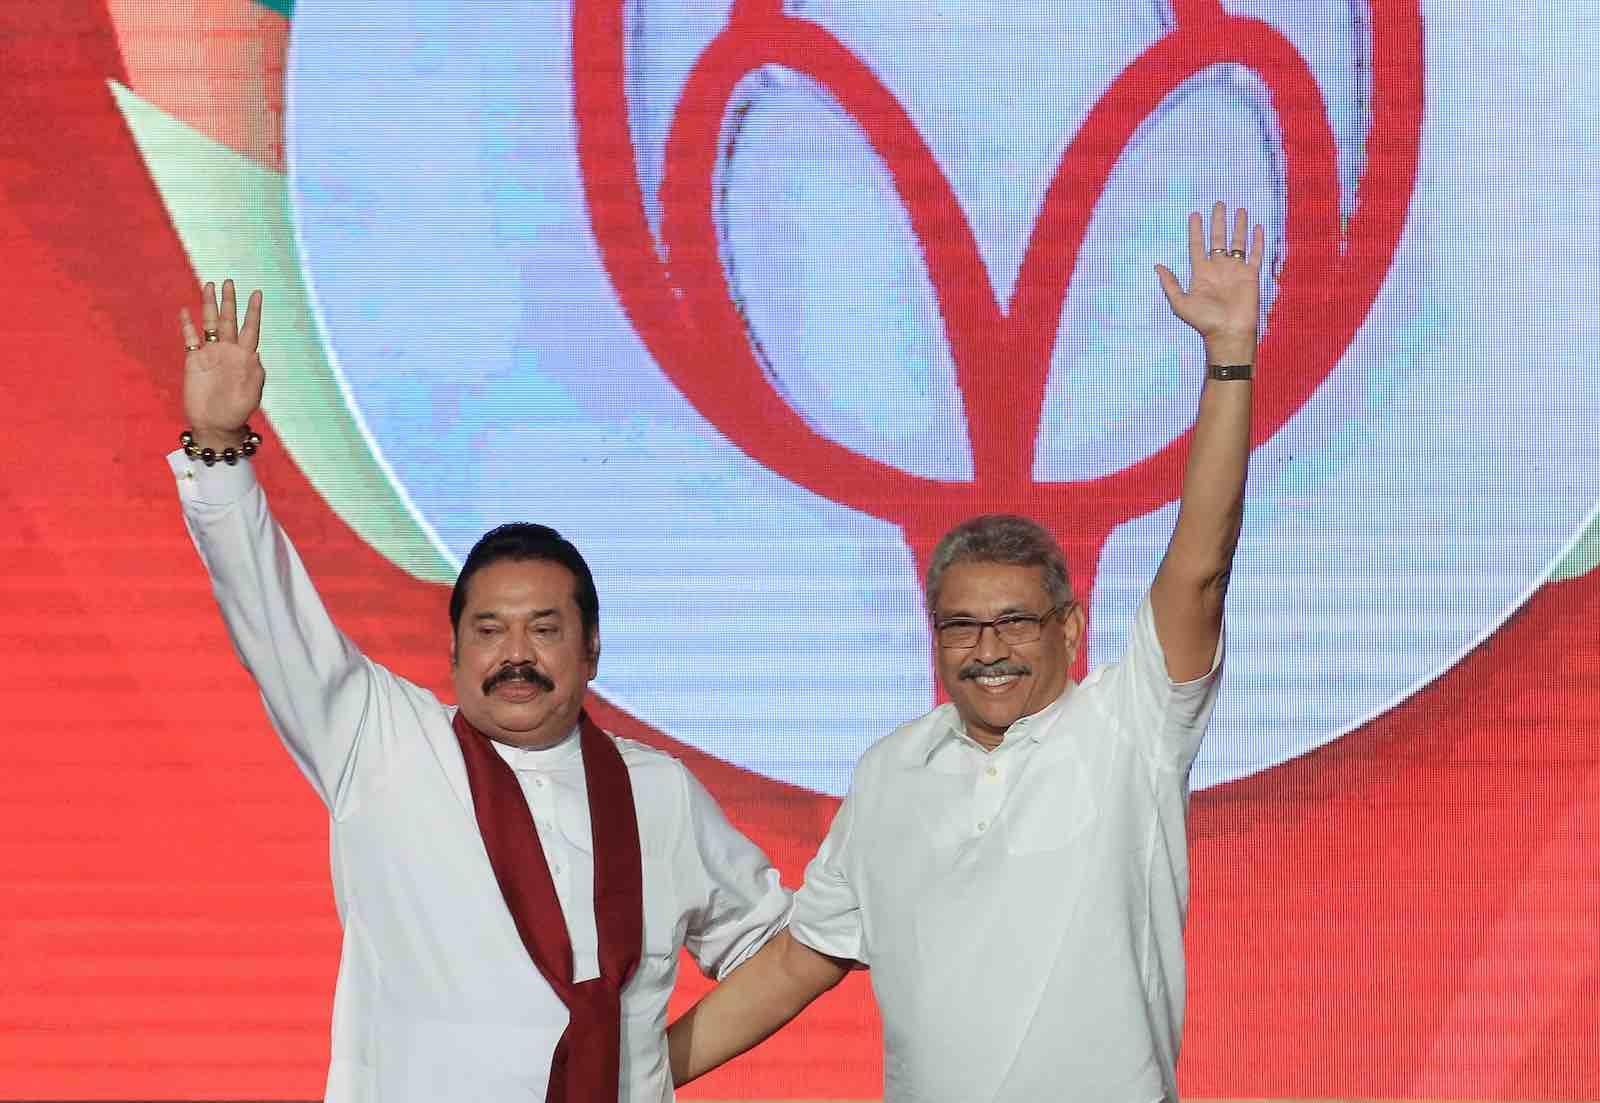 sri lanka election - photo #19